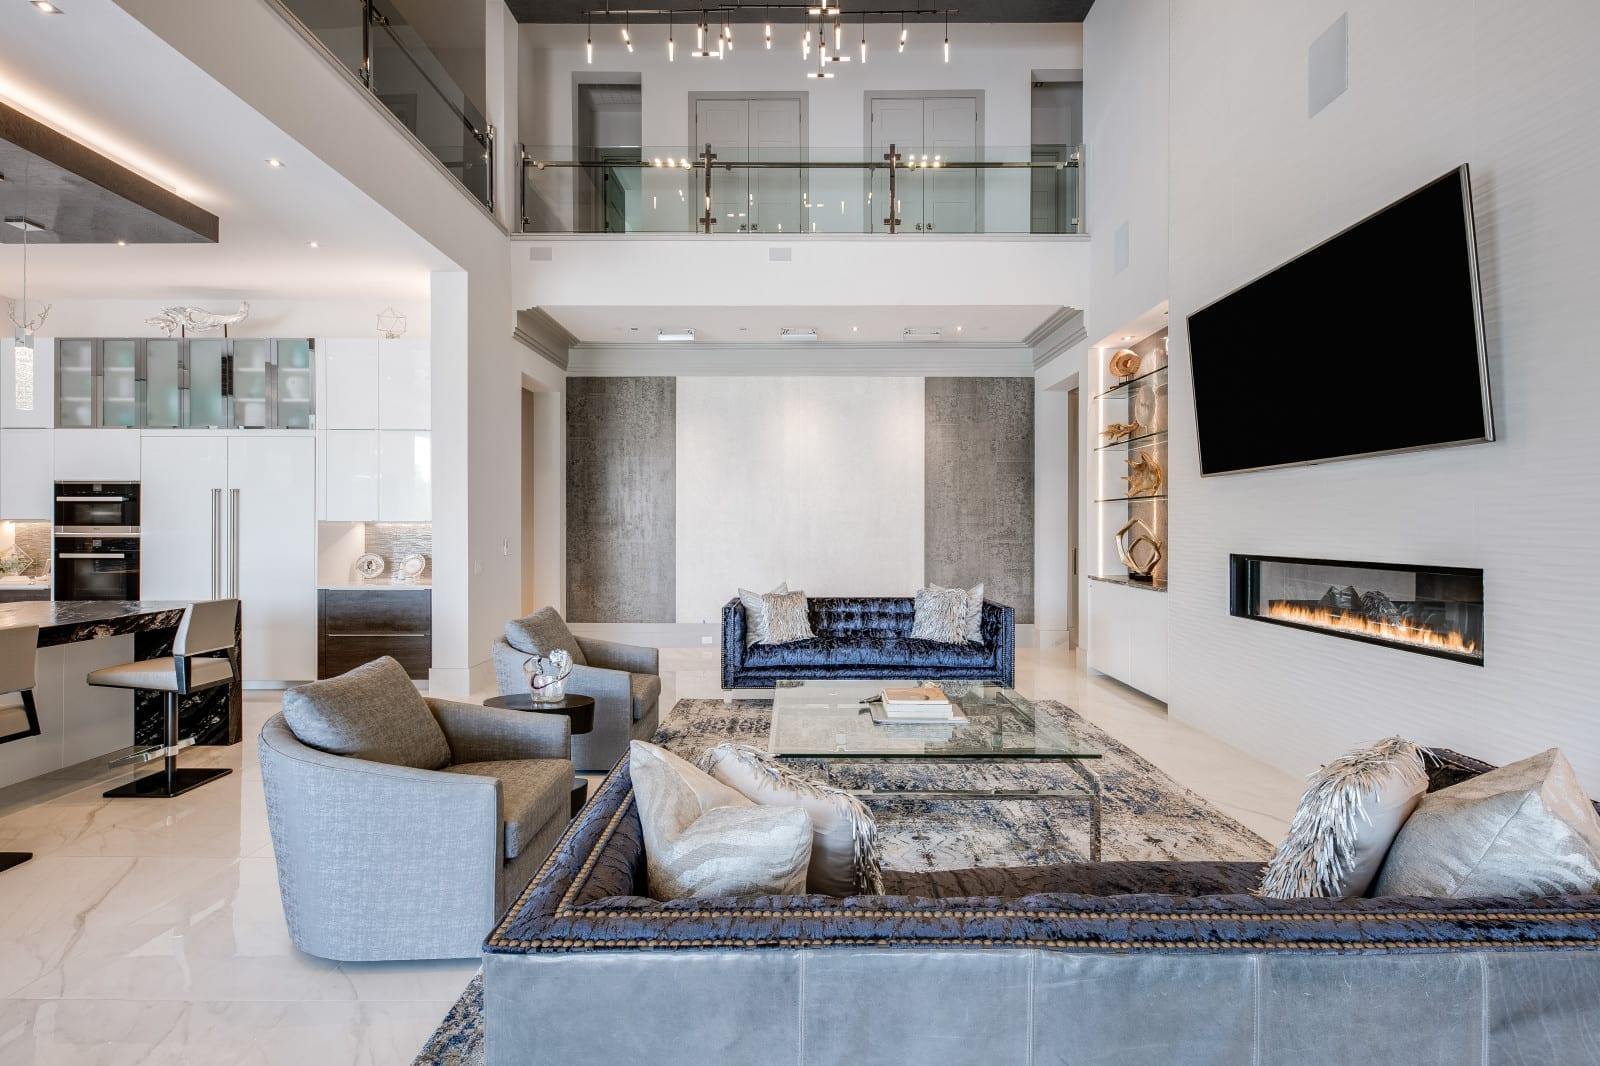 Custom Home Build and Interior Design # 10 - Millennial Design + Build, Custom Home Builders in Dallas Texas, modern style homes, Property Evaluator, Interior Designers, using BIM Technology and Home 3D Model.